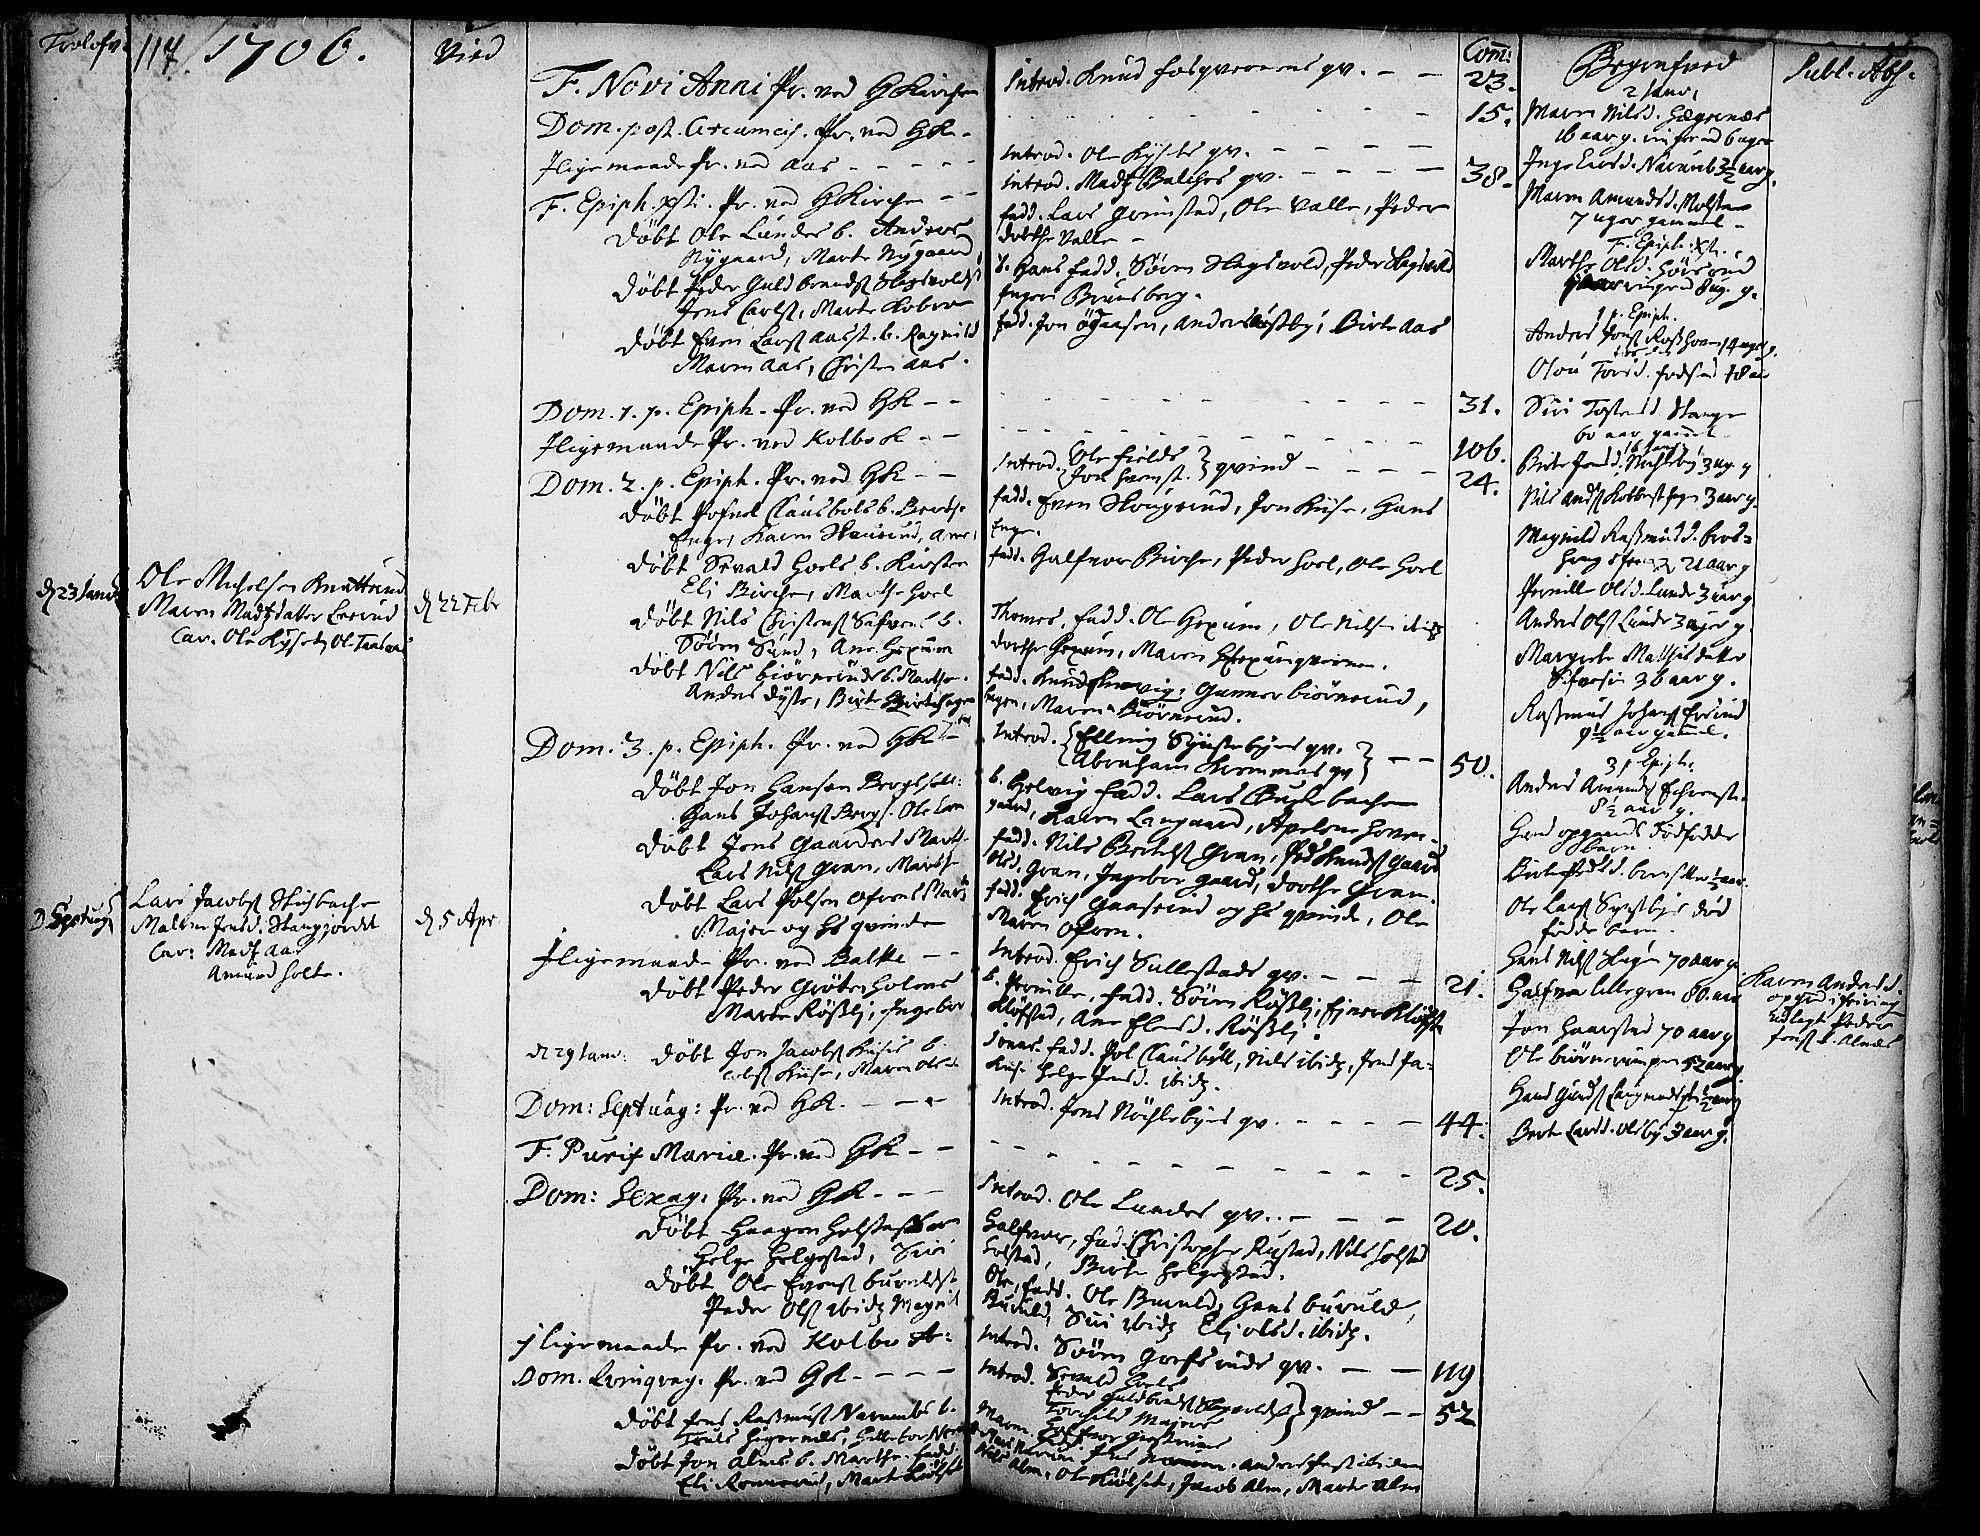 SAH, Toten prestekontor, Ministerialbok nr. 1, 1695-1713, s. 117